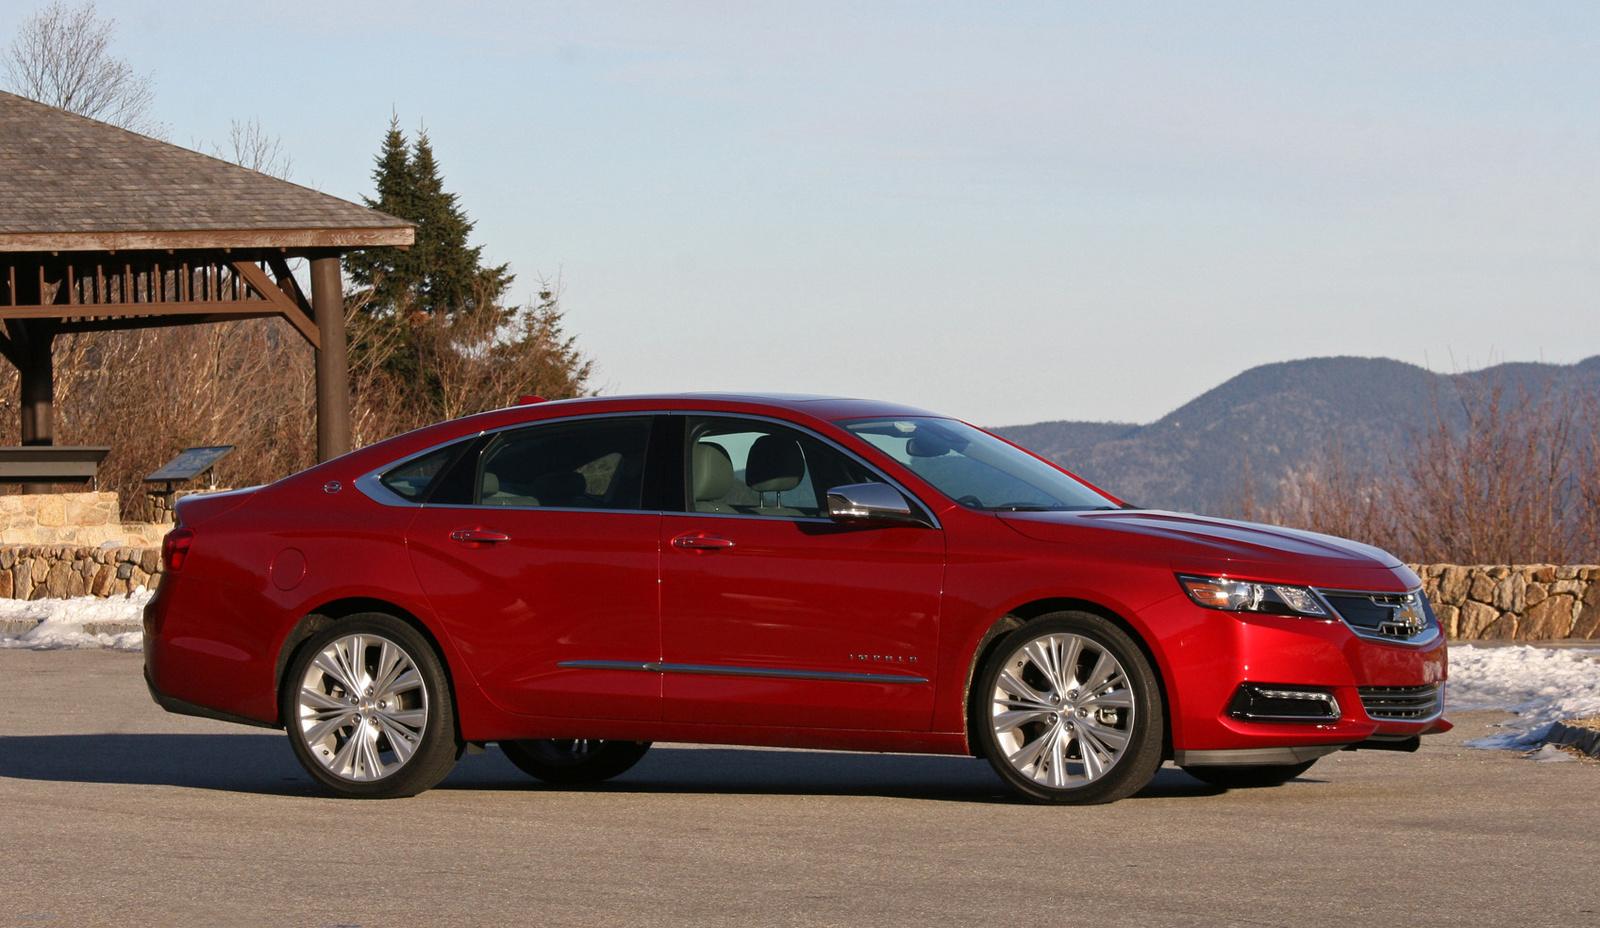 2014 chevrolet impala test drive review cargurus. Black Bedroom Furniture Sets. Home Design Ideas